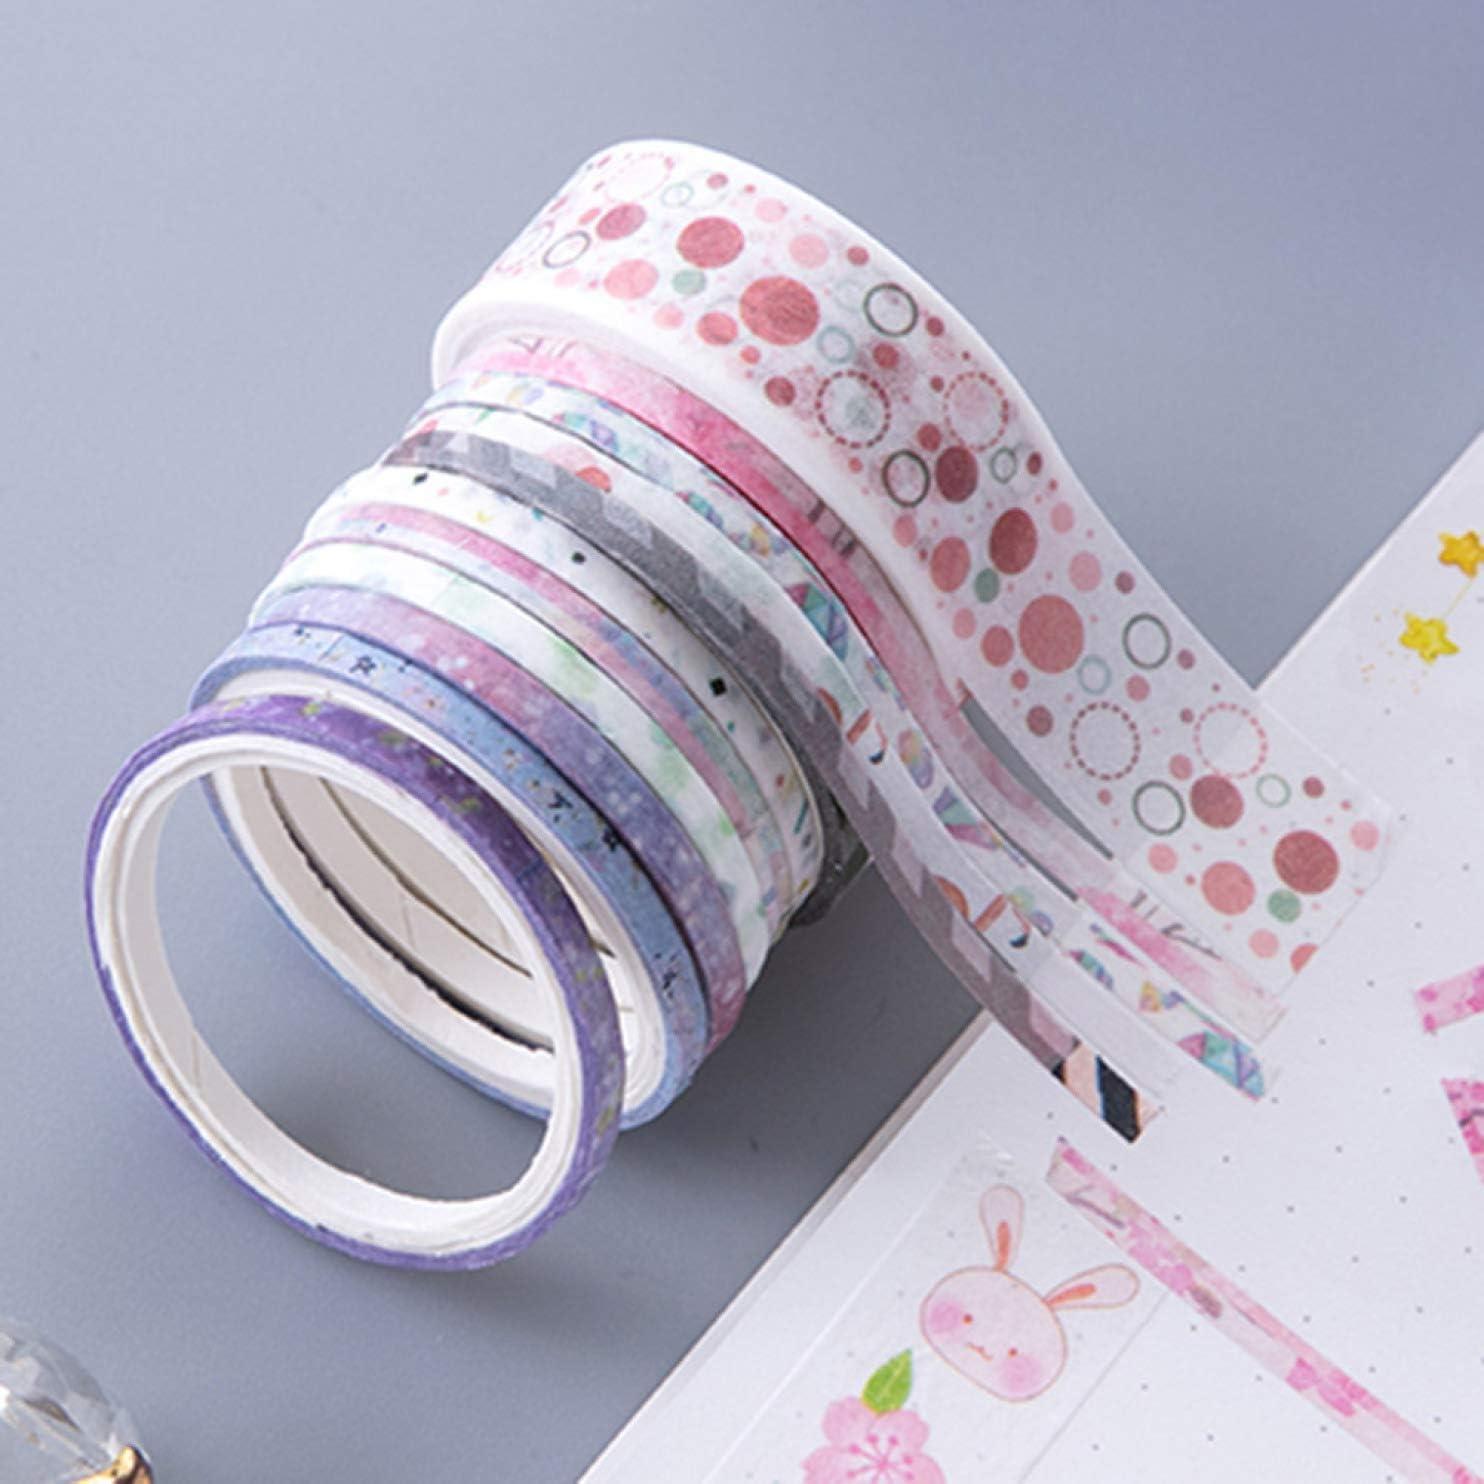 Suang Trusted 100 Rollen Washi Tape Set Folie Gold Skinny Dekorative Washi Tapes 1-5 mm breit DIY Masking Tape